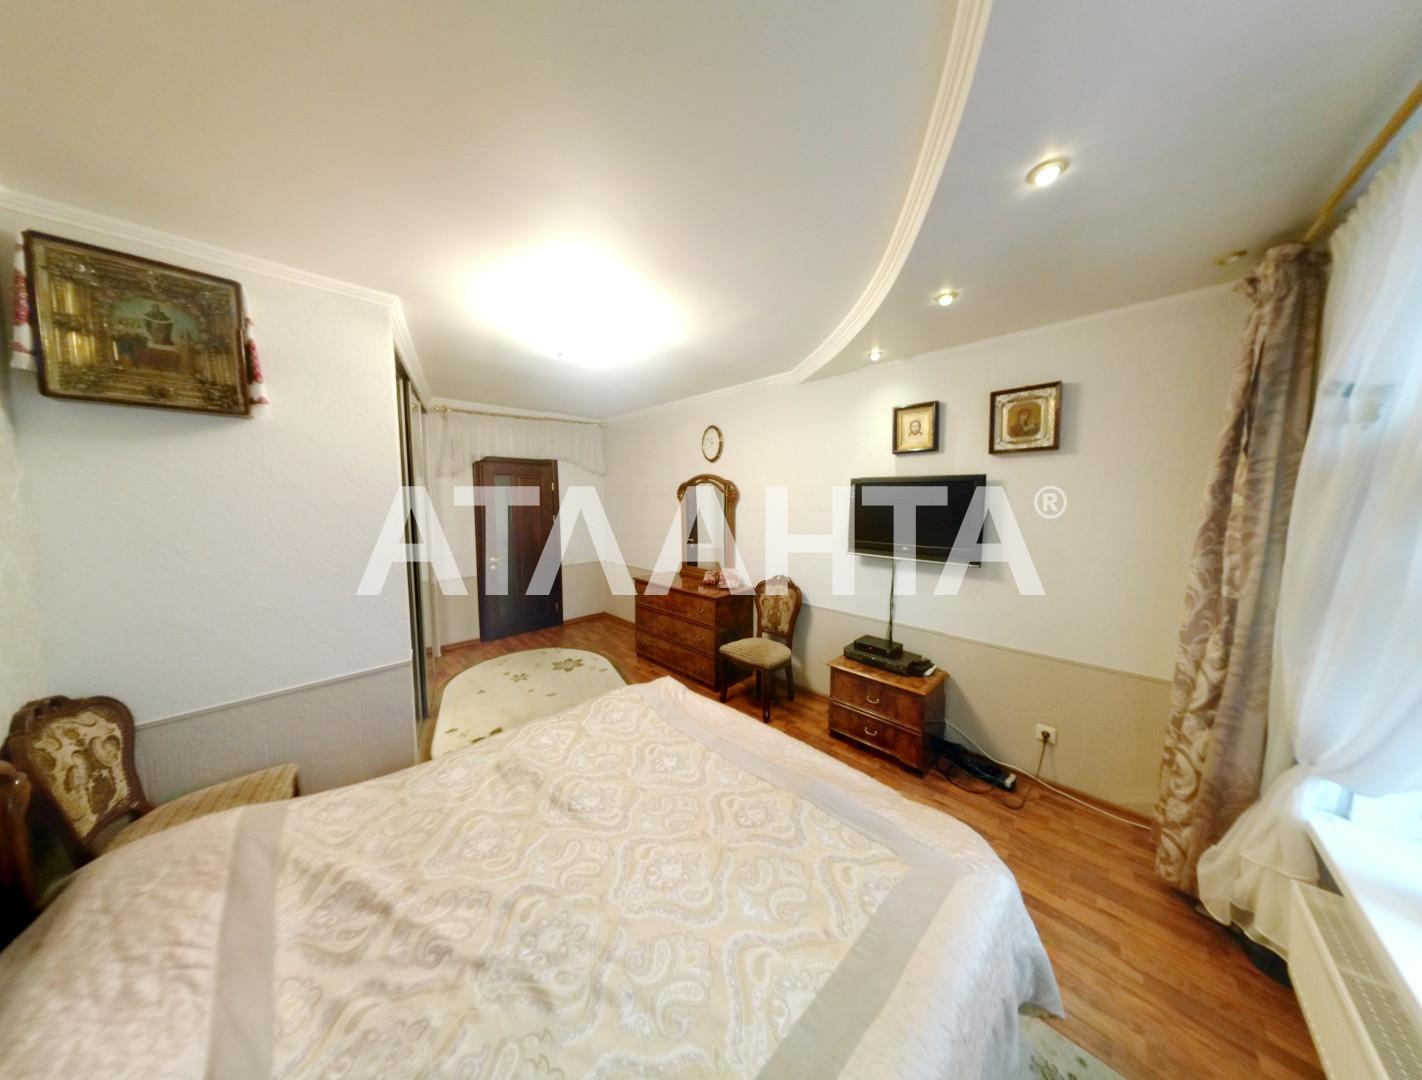 Продается 3-комнатная Квартира на ул. Ул. Ломоносова — 139 600 у.е. (фото №19)